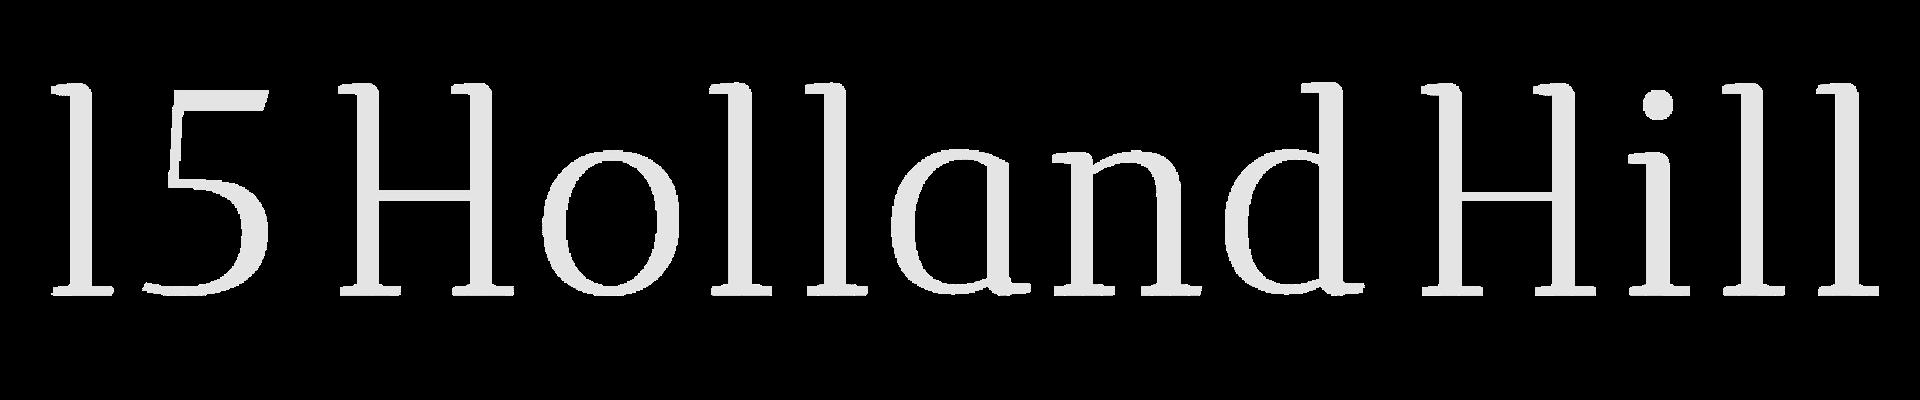 15 Holland Hill logo white